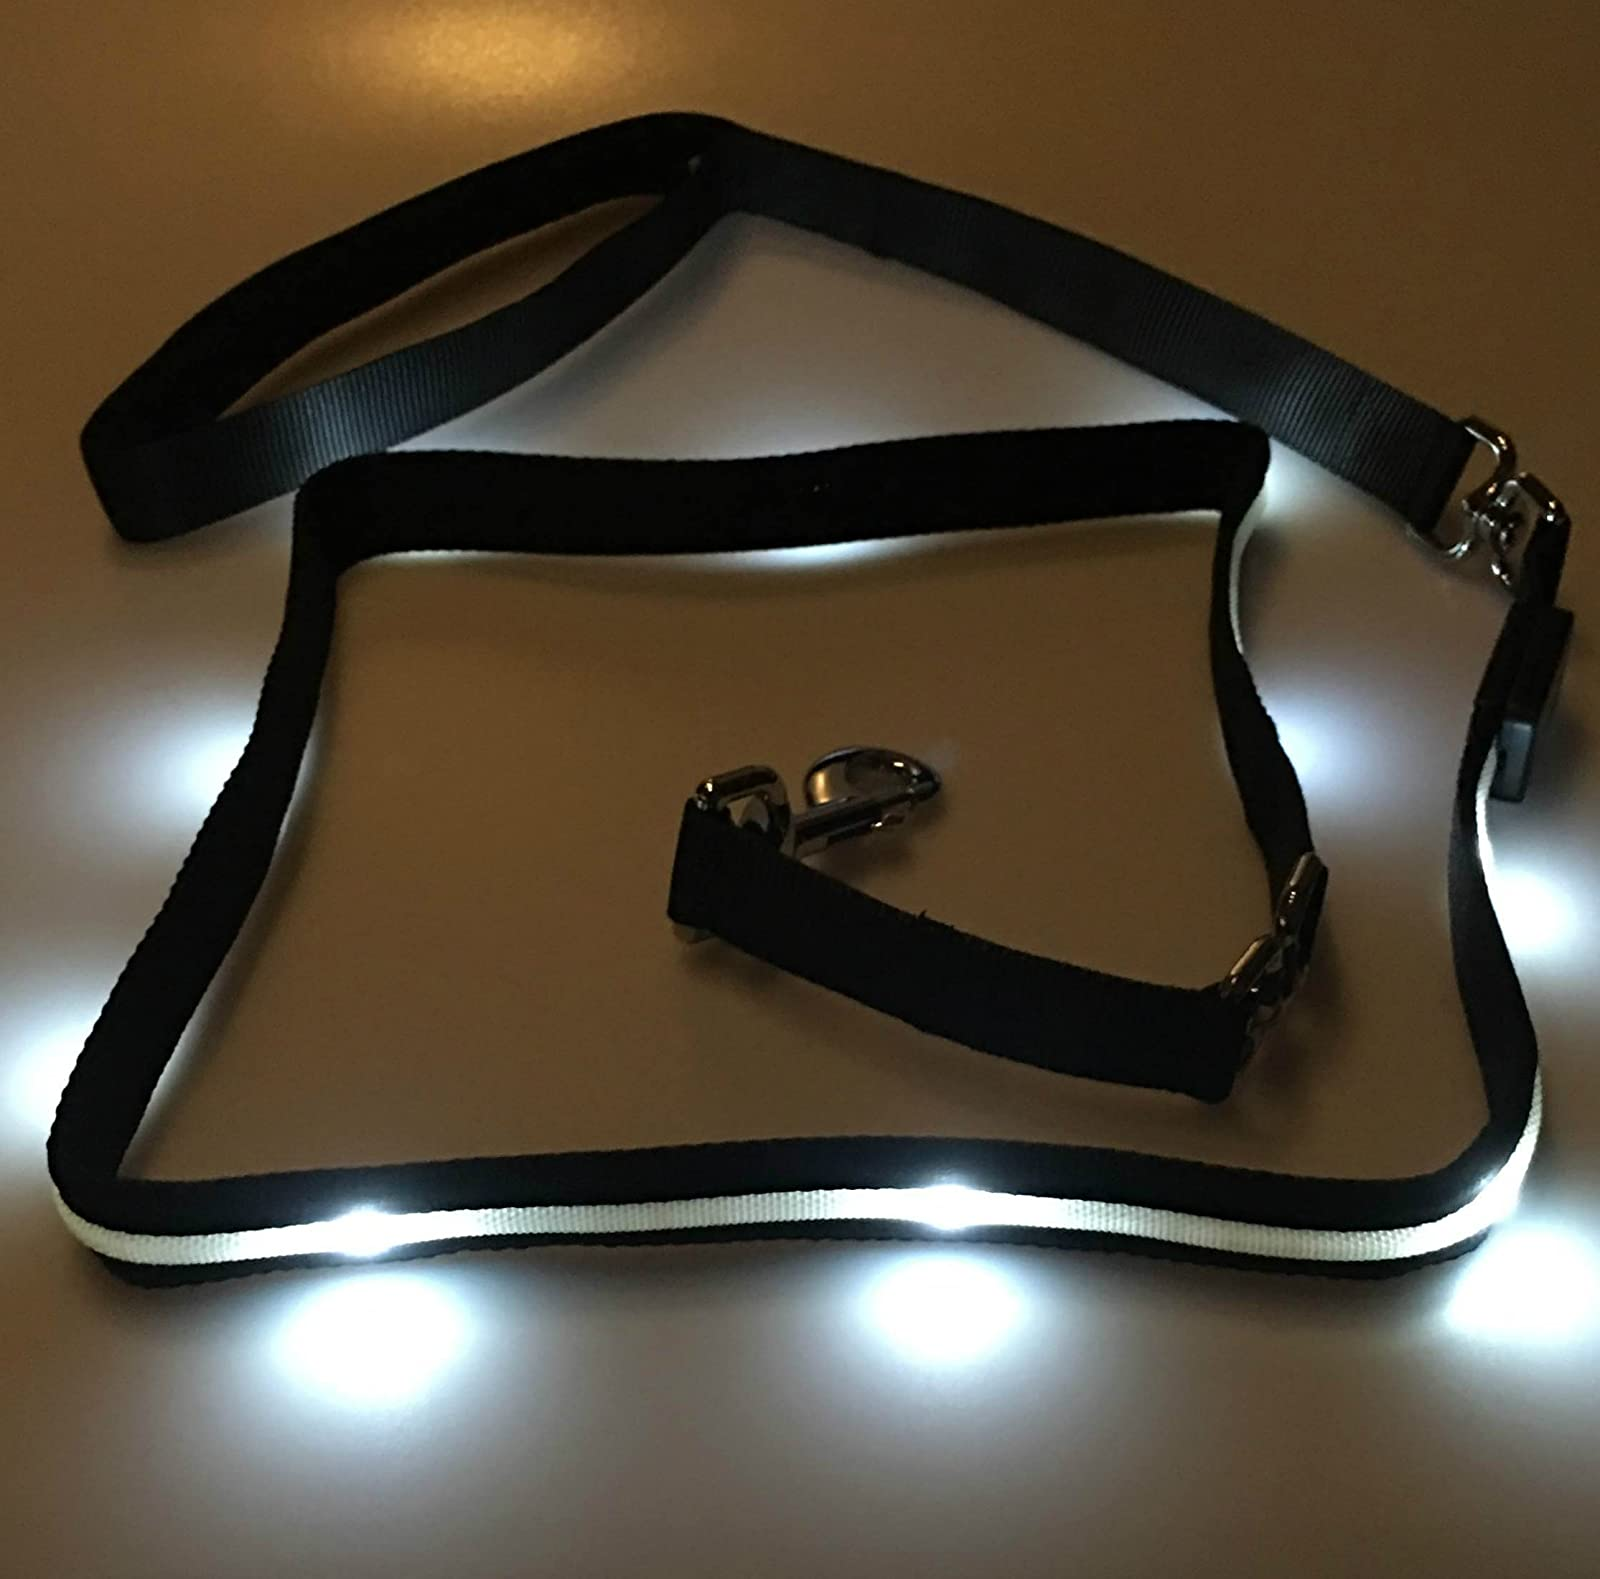 Blazin' Safety LED Dog Leash - USB Rechargeable - 6